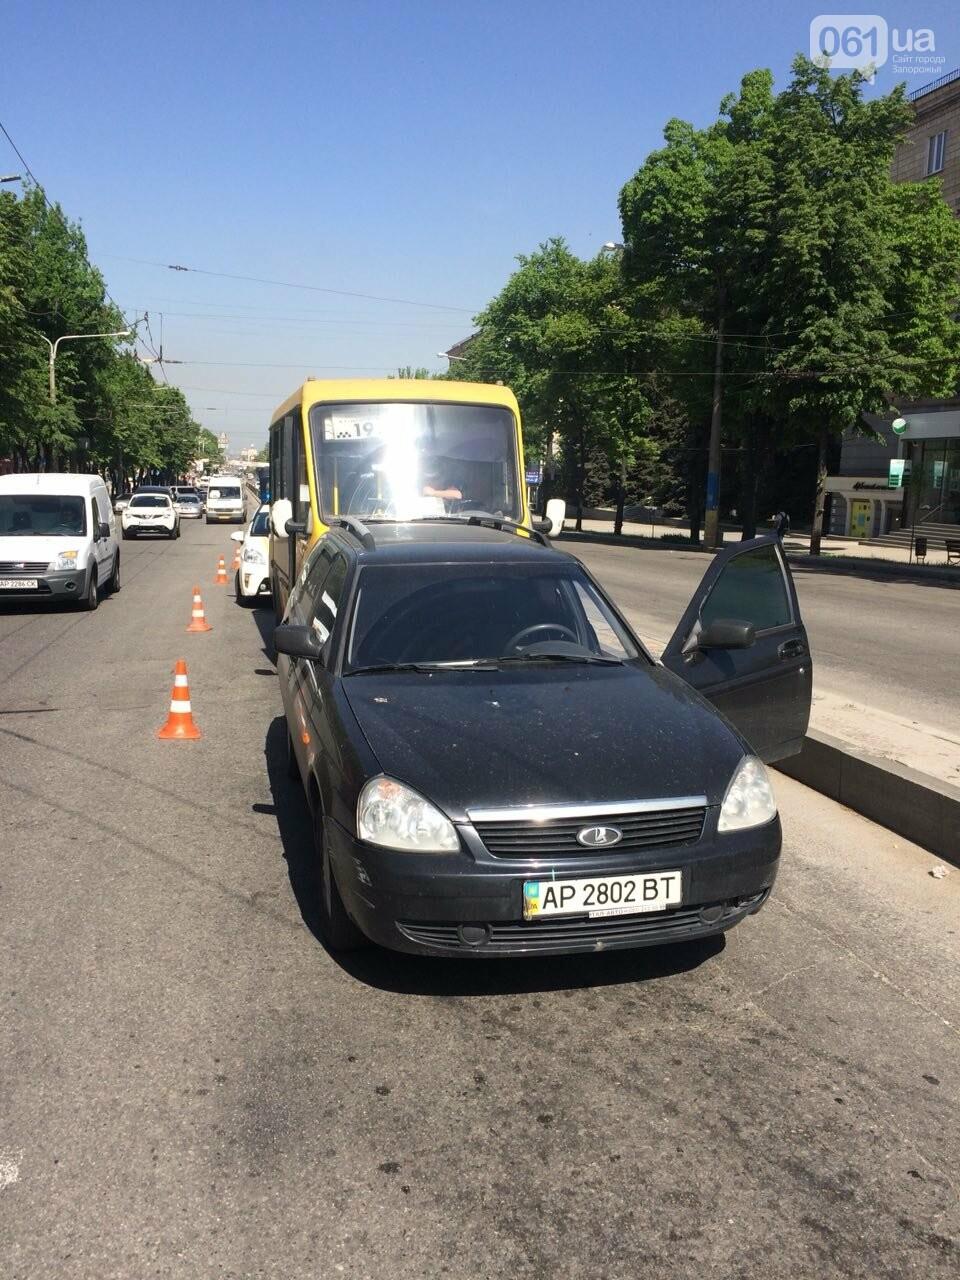 В центре Запорожья маршрутчик въехал в легковое авто, - ФОТО, фото-2